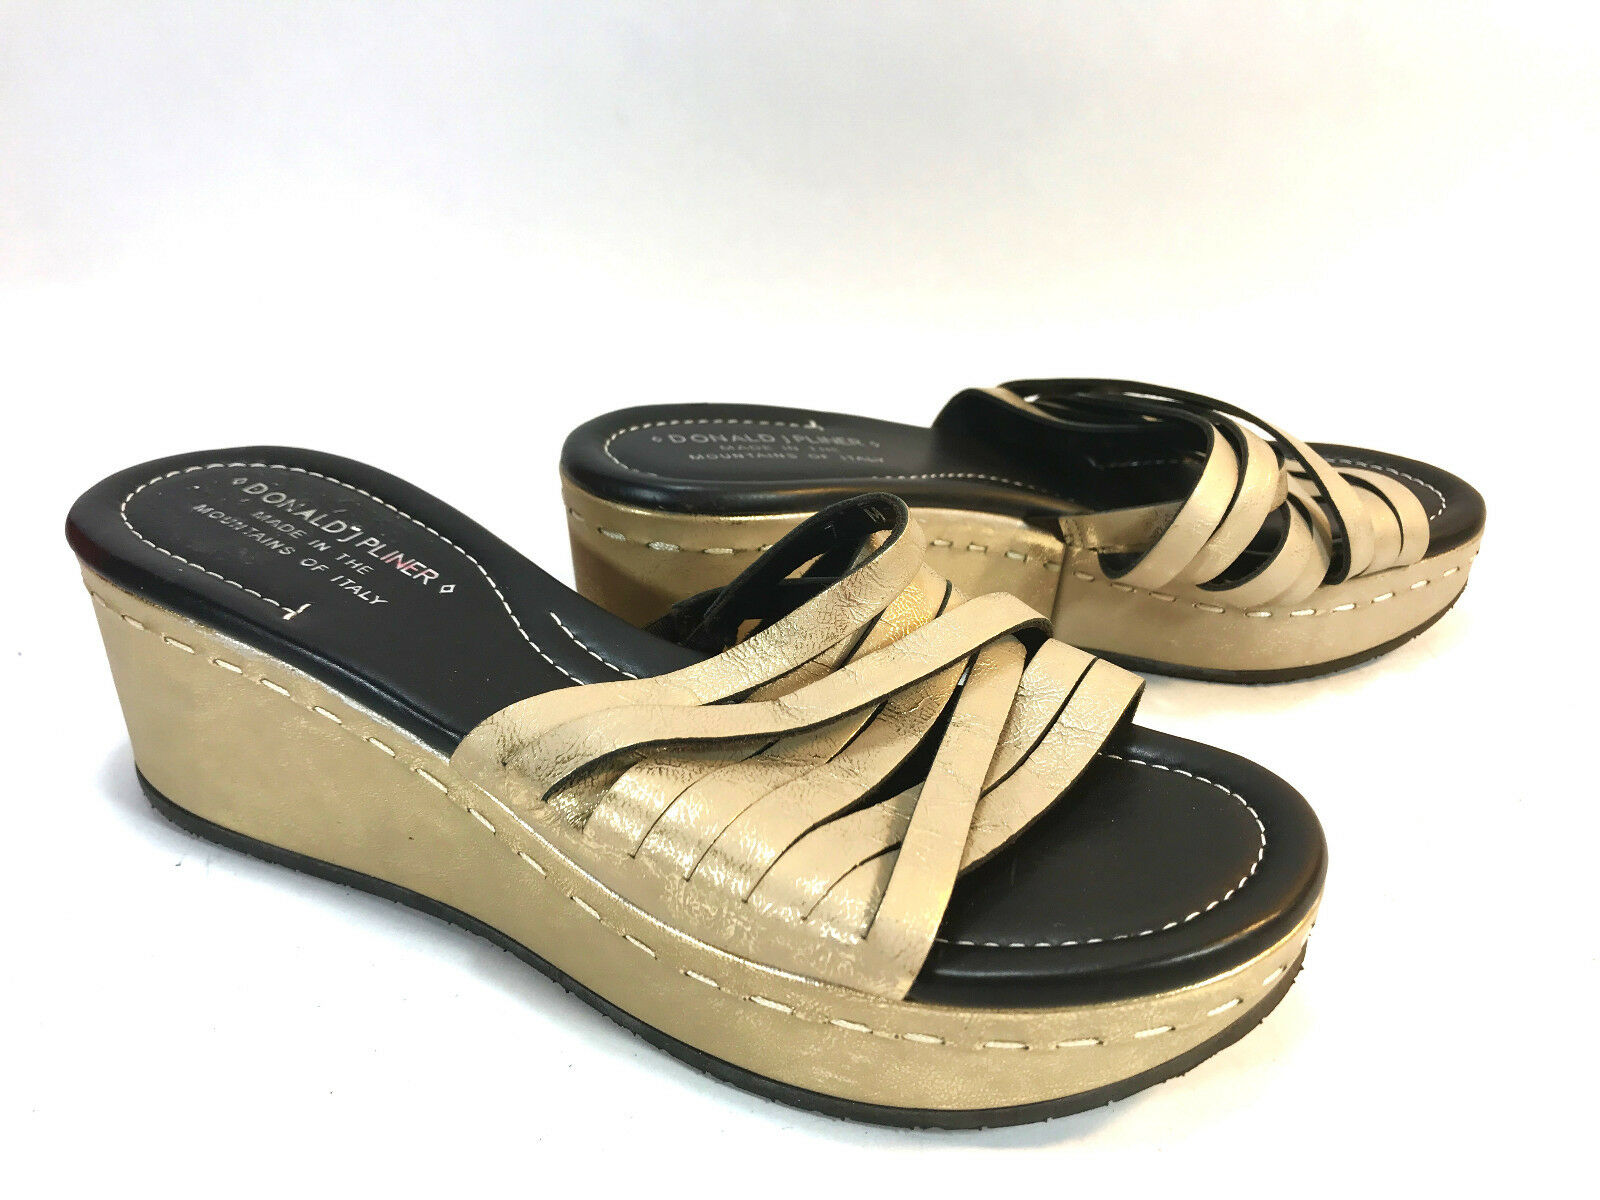 DONALD PLINER Italian champagne beige metallic wedge wedge wedge strappy platform sandals 7 473735